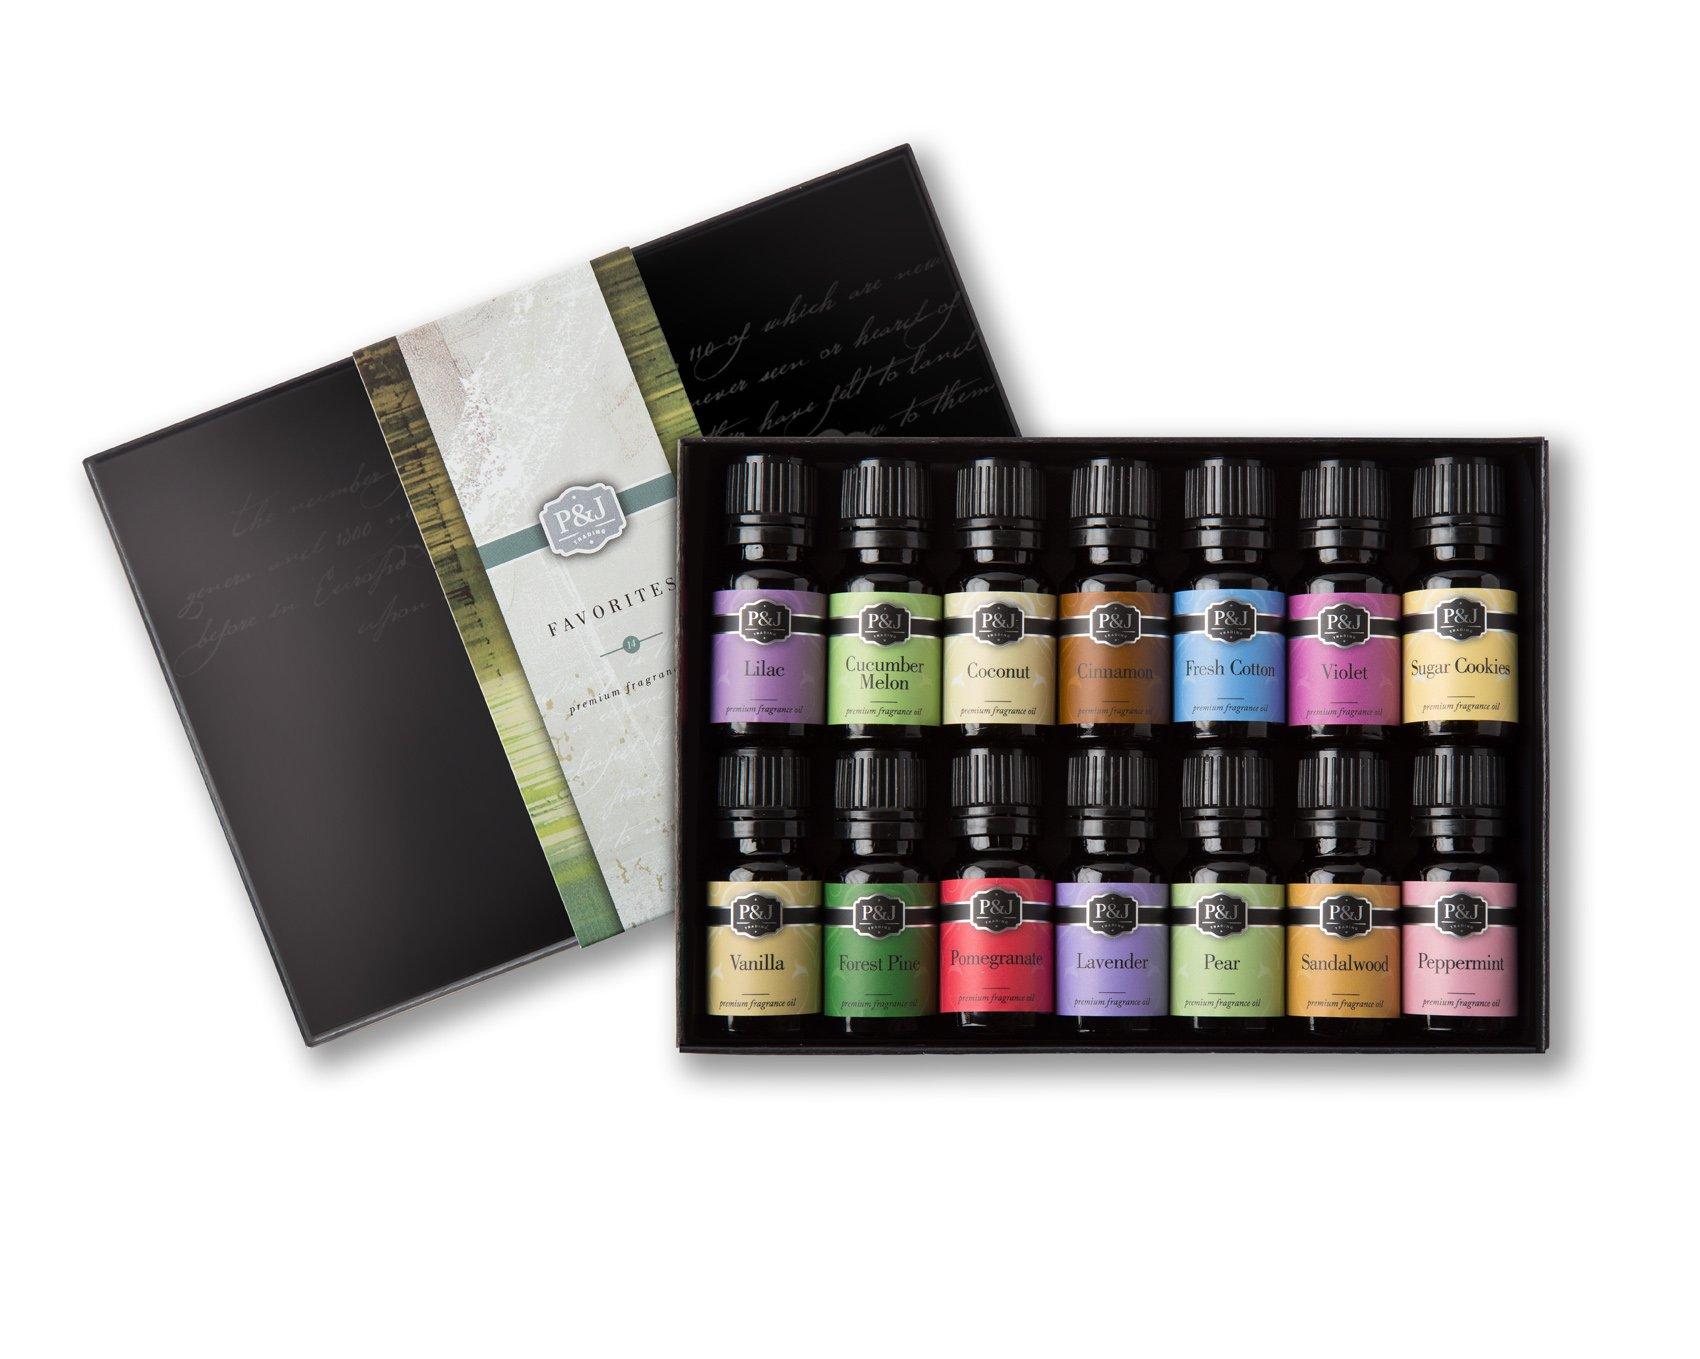 P&J Trading Favorites Set of 14 Premium Grade Fragrance Oils - 10ml by P&J Trading